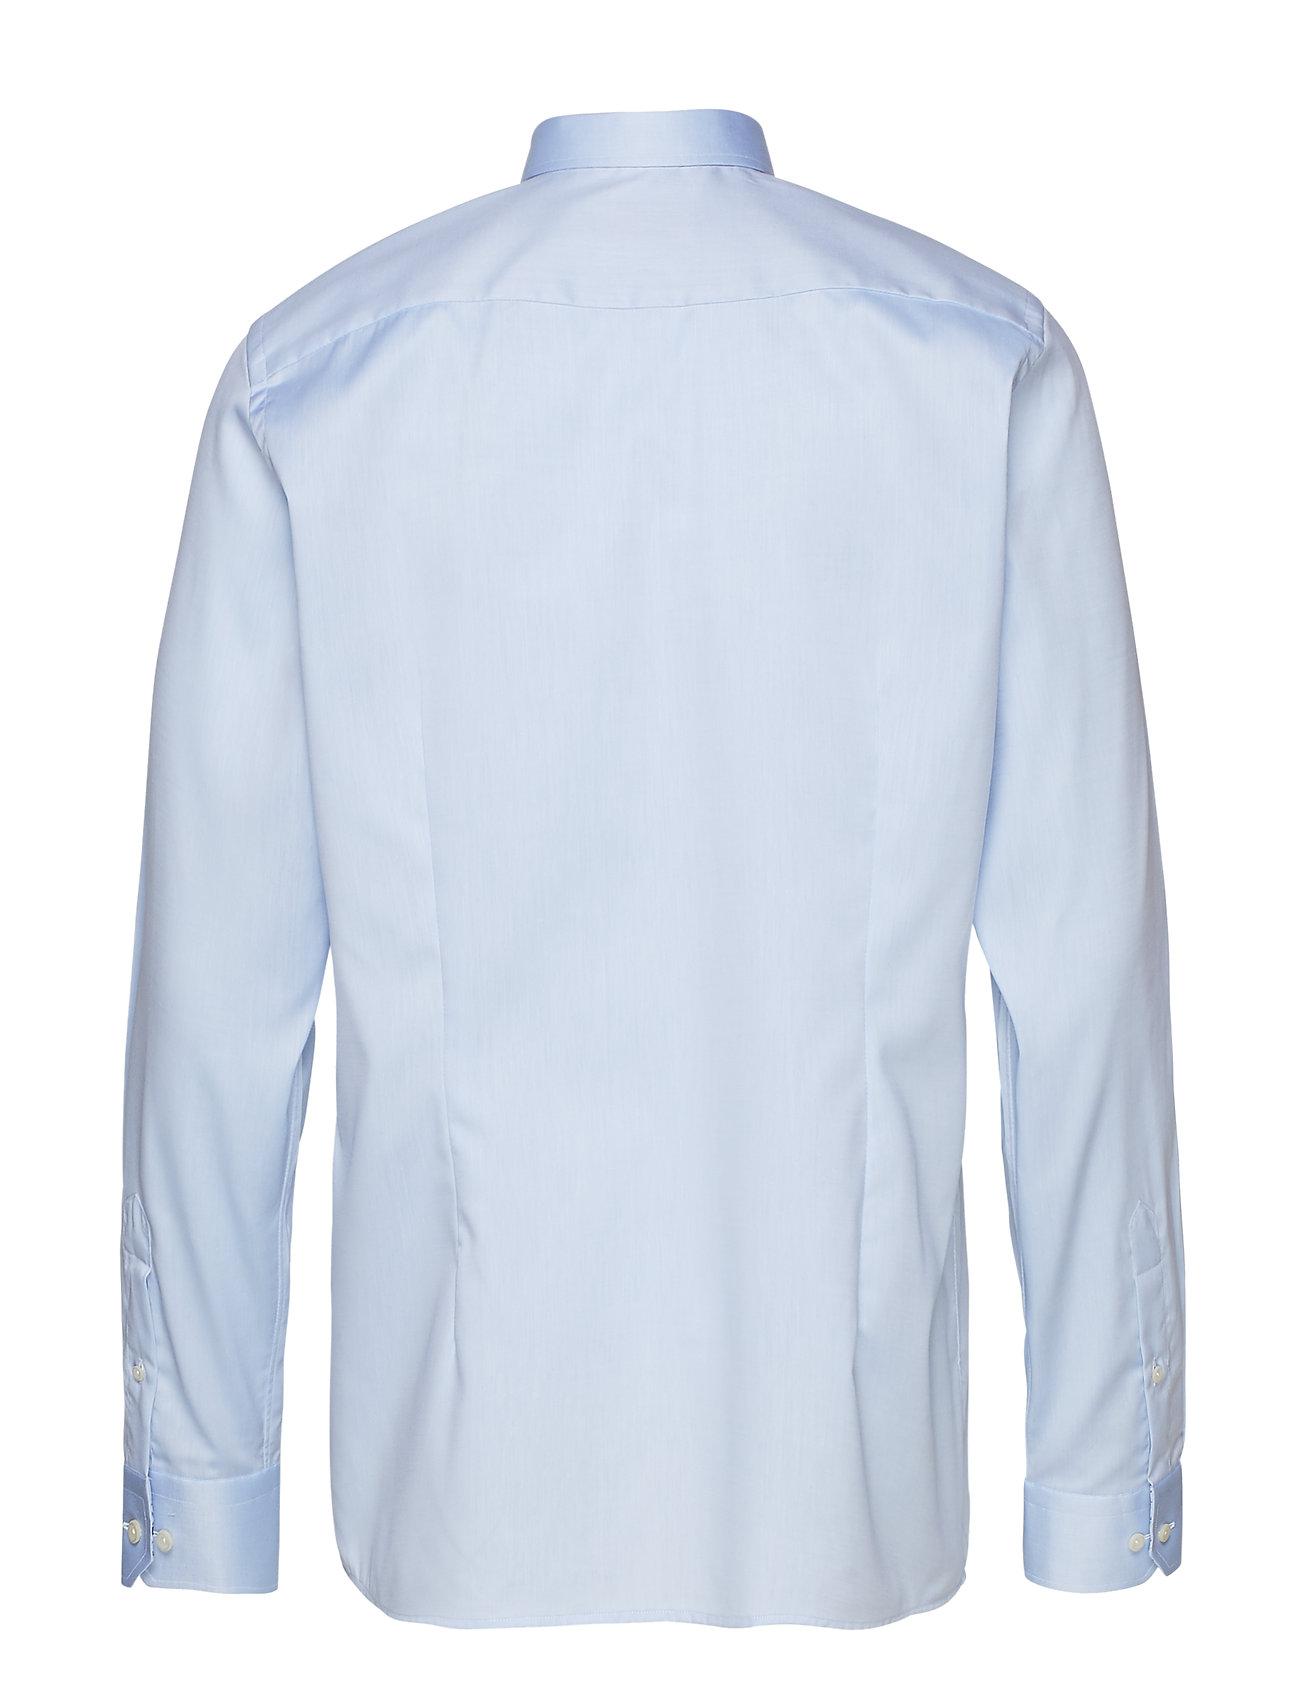 � papyrus Twill DetailsblueEton Sky Shirt Blue Print SUMqzpVG